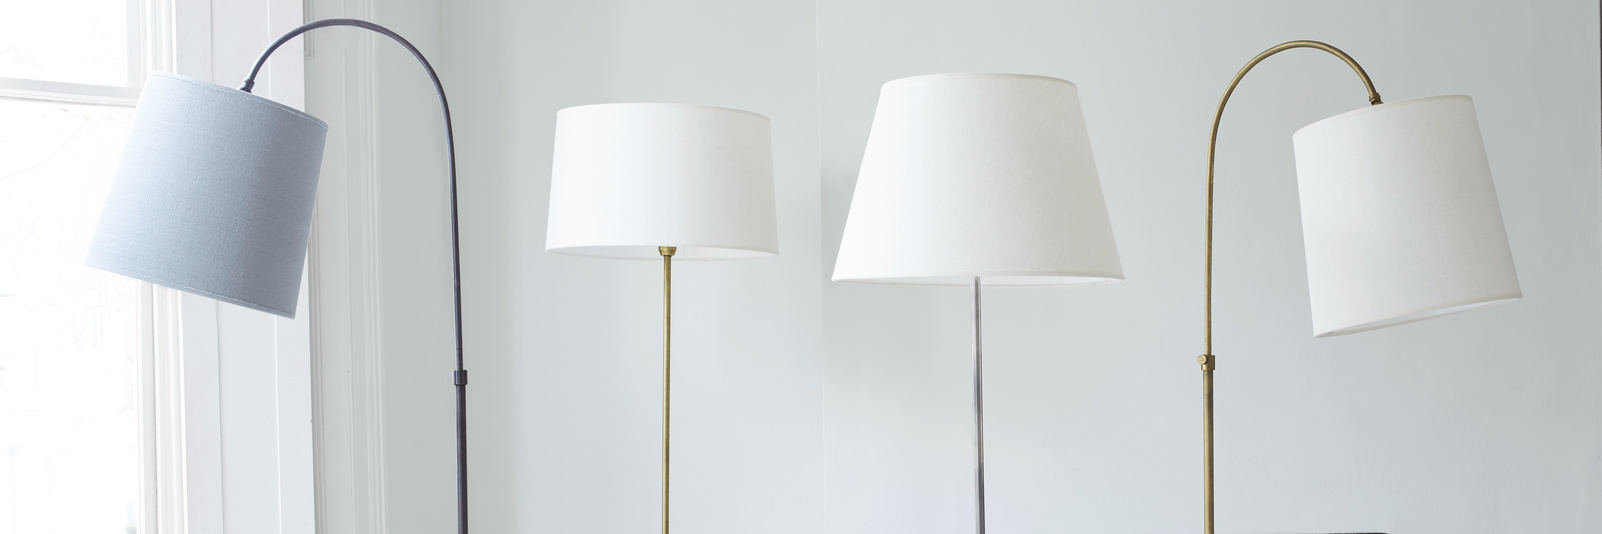 Floor lamp range